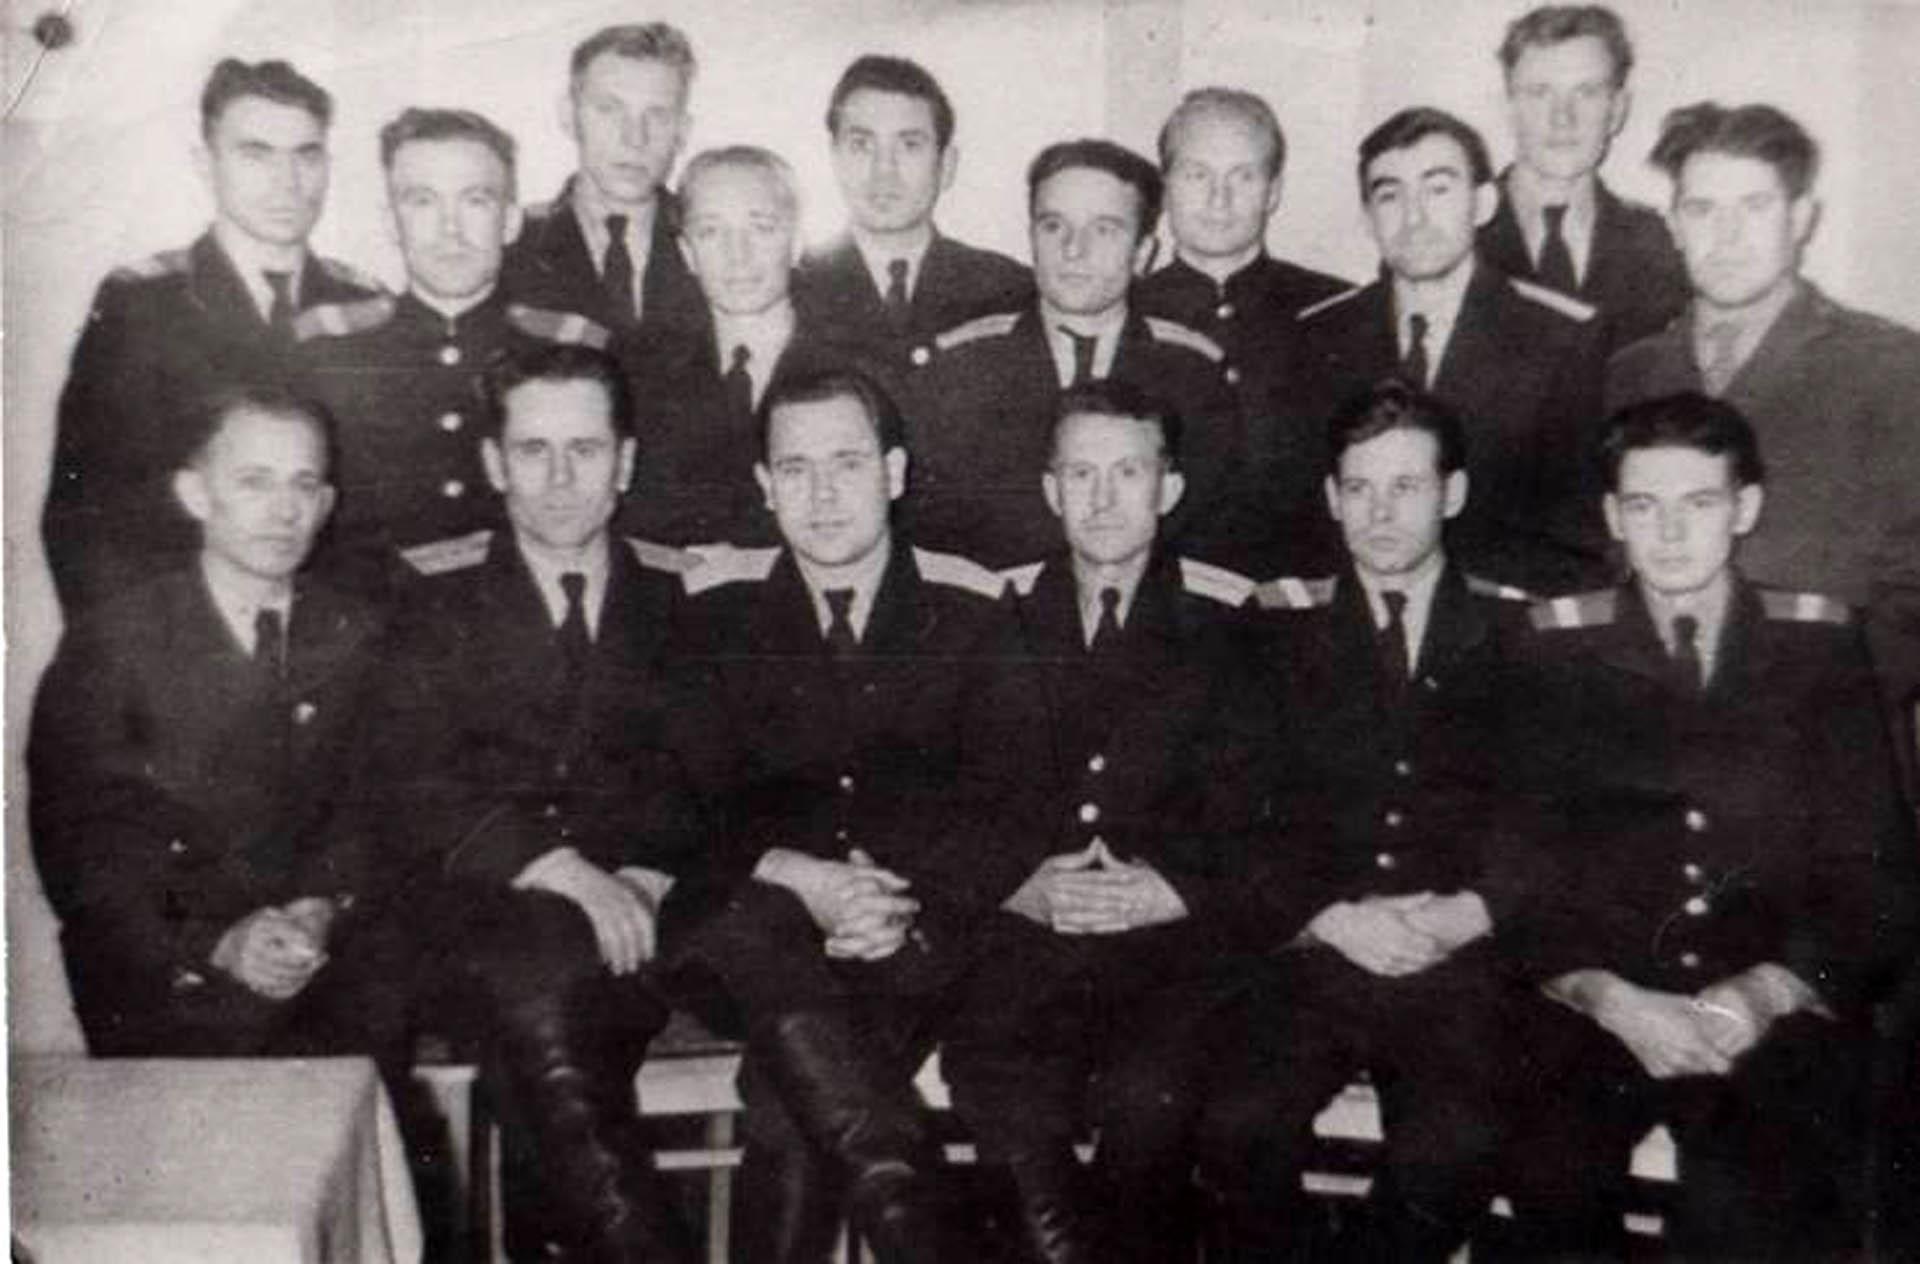 Сотрудники Нязепетровской милиции в  конце  50-х годов  ХХ века